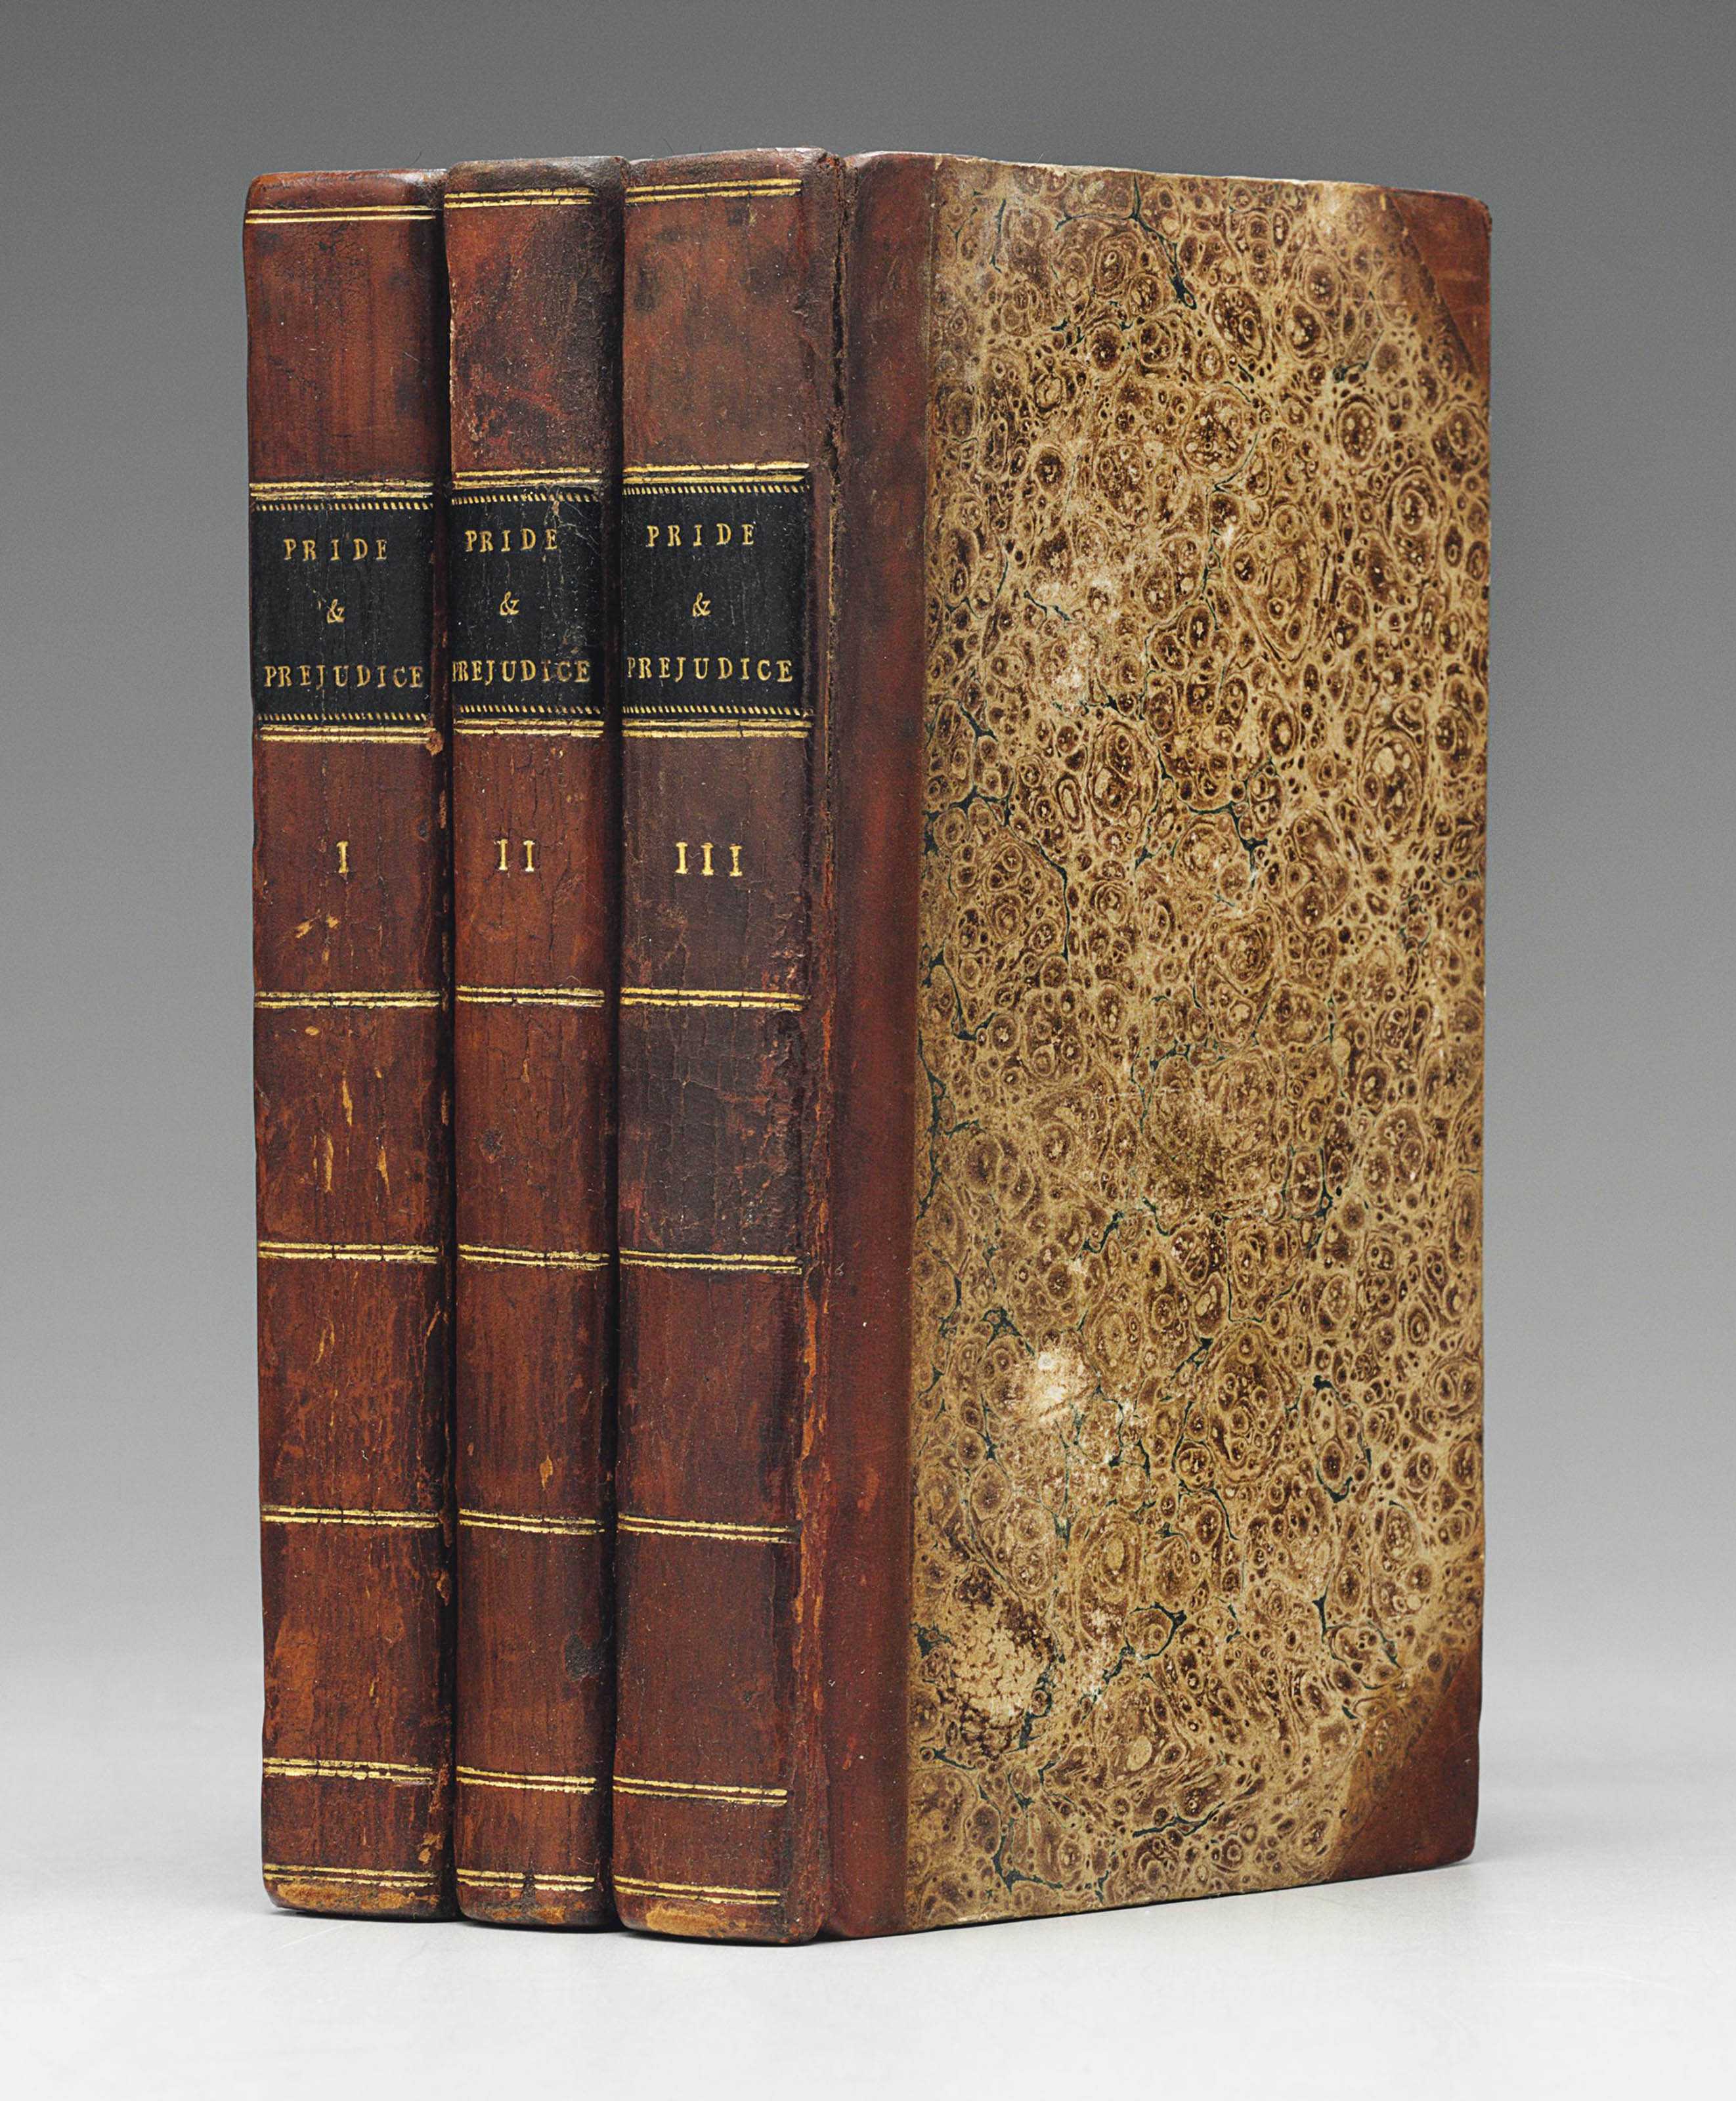 [AUSTEN, Jane (1775-1817)]. Pride and Prejudice. London: Printed for T. Egerton, 1813.